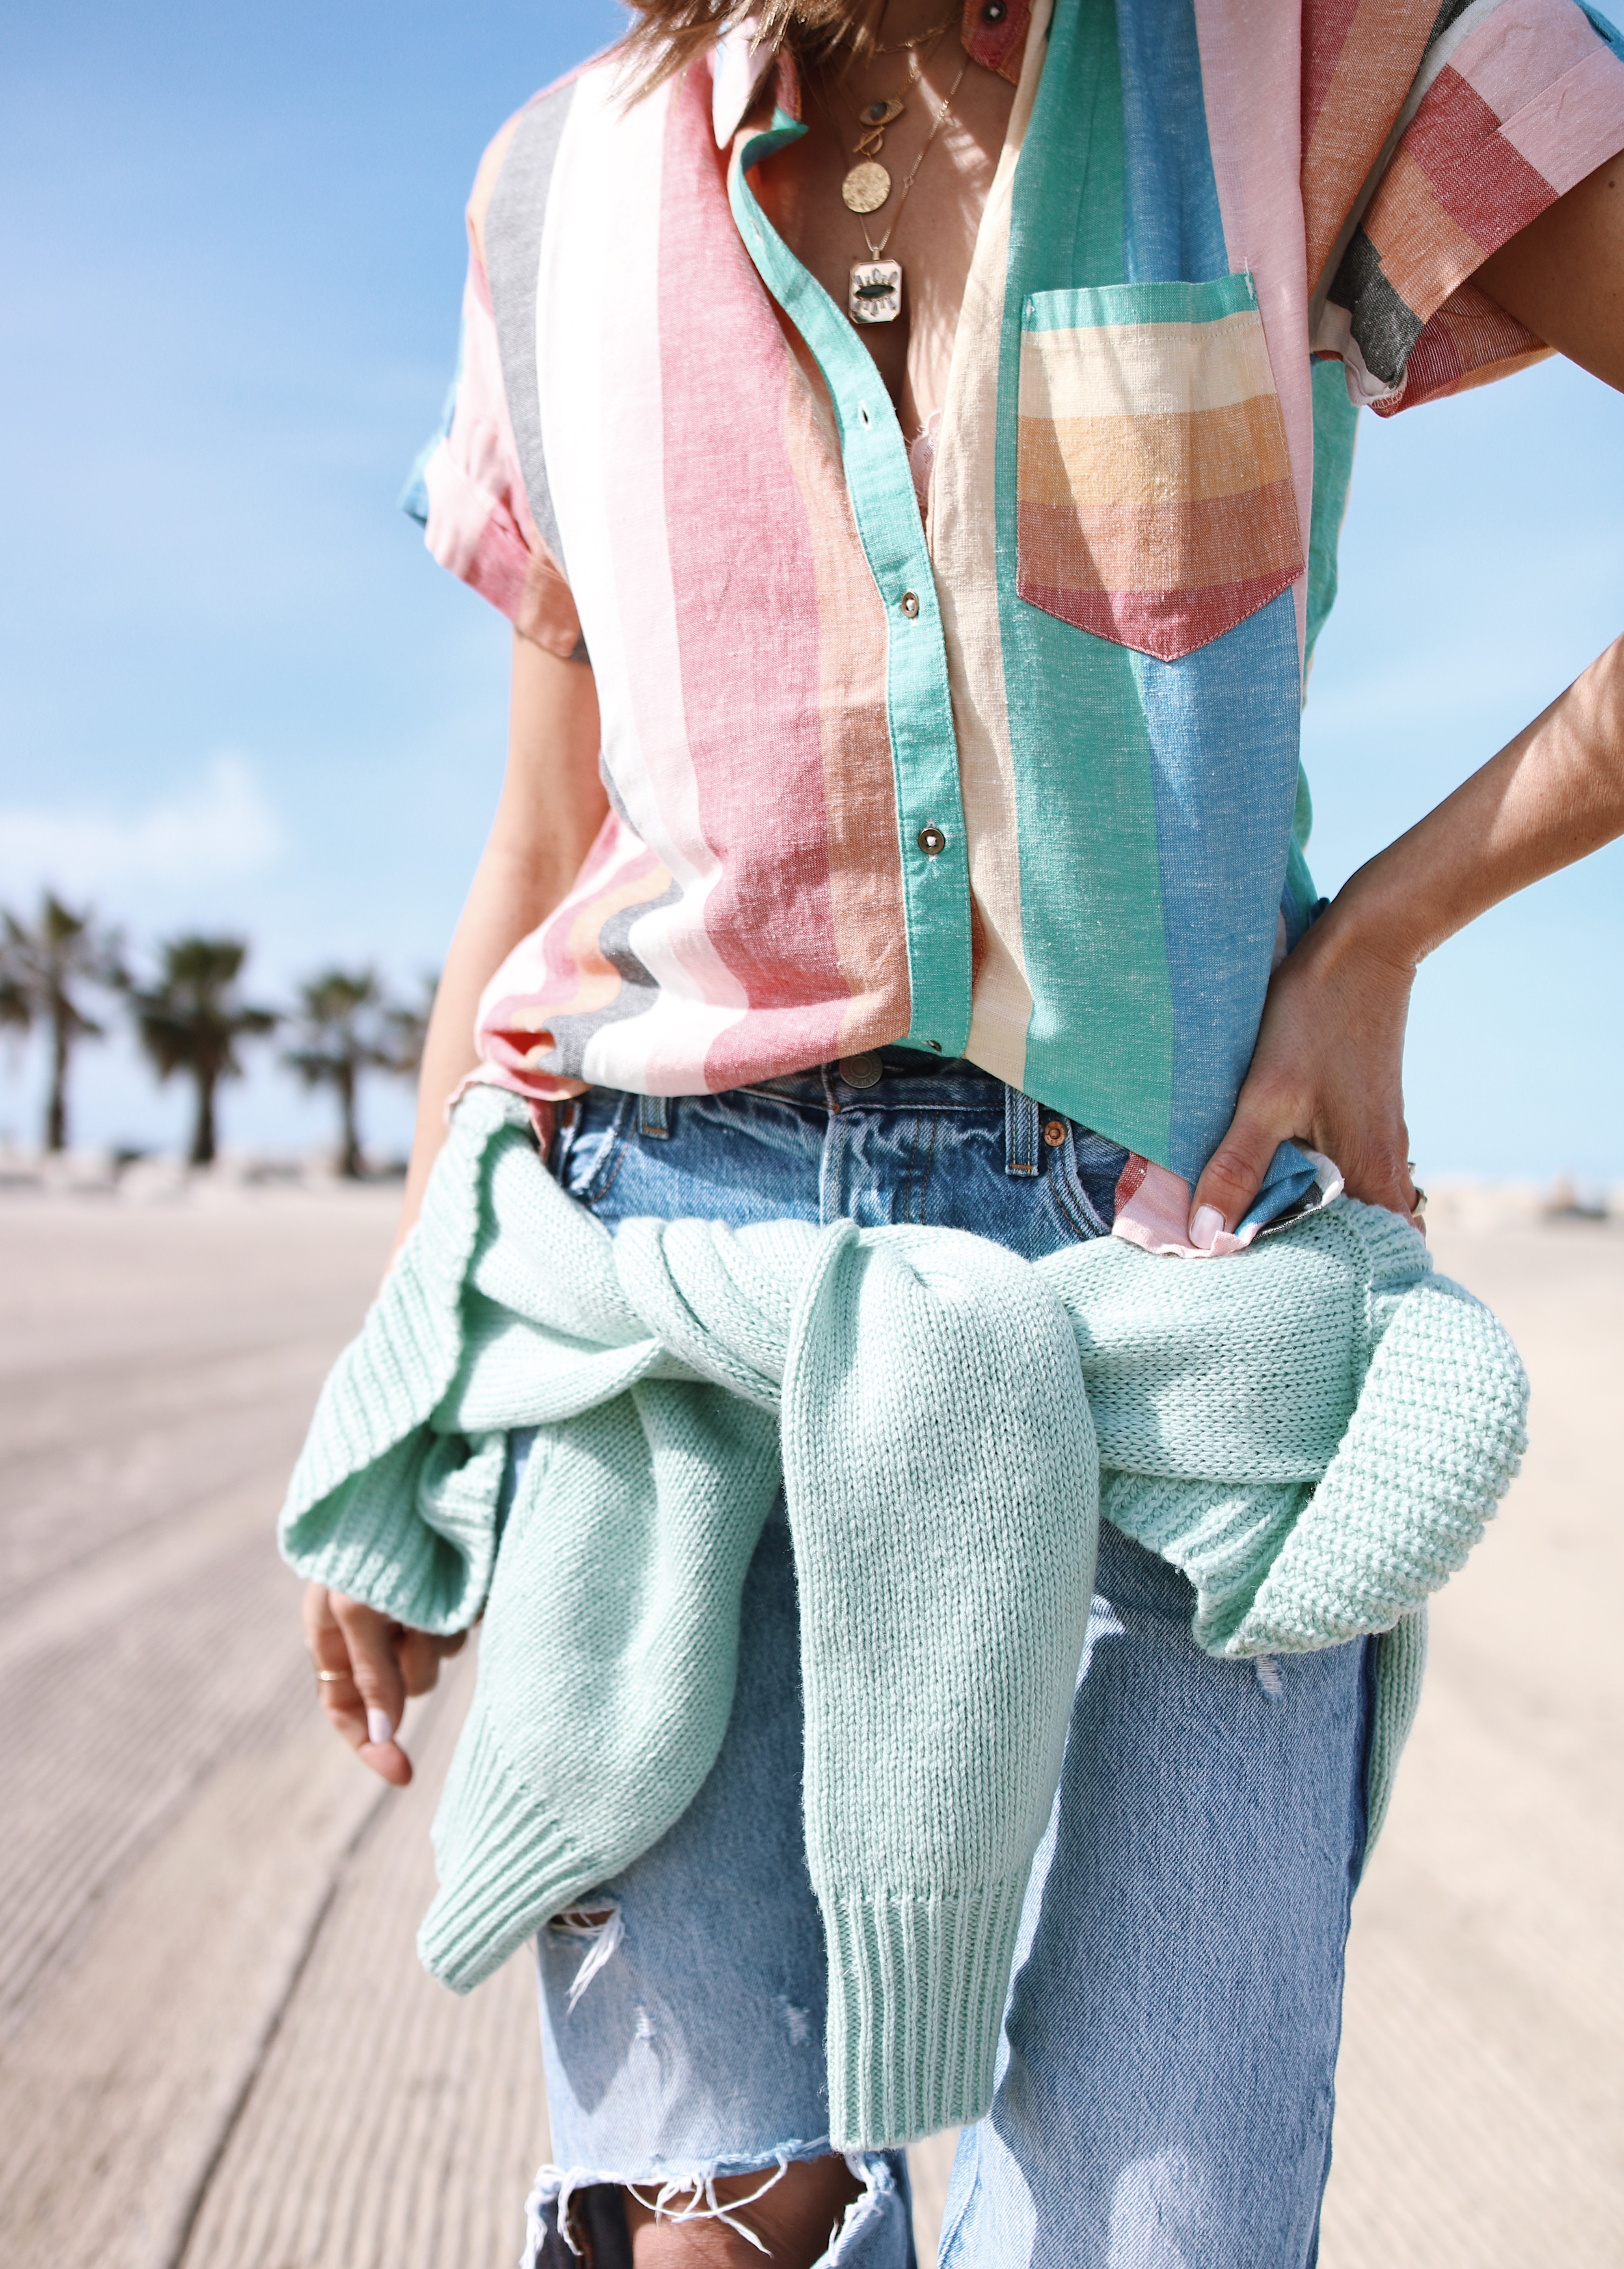 @chon.and.chon www.chonandchon.com billabong x sincerely jules santorini shirt